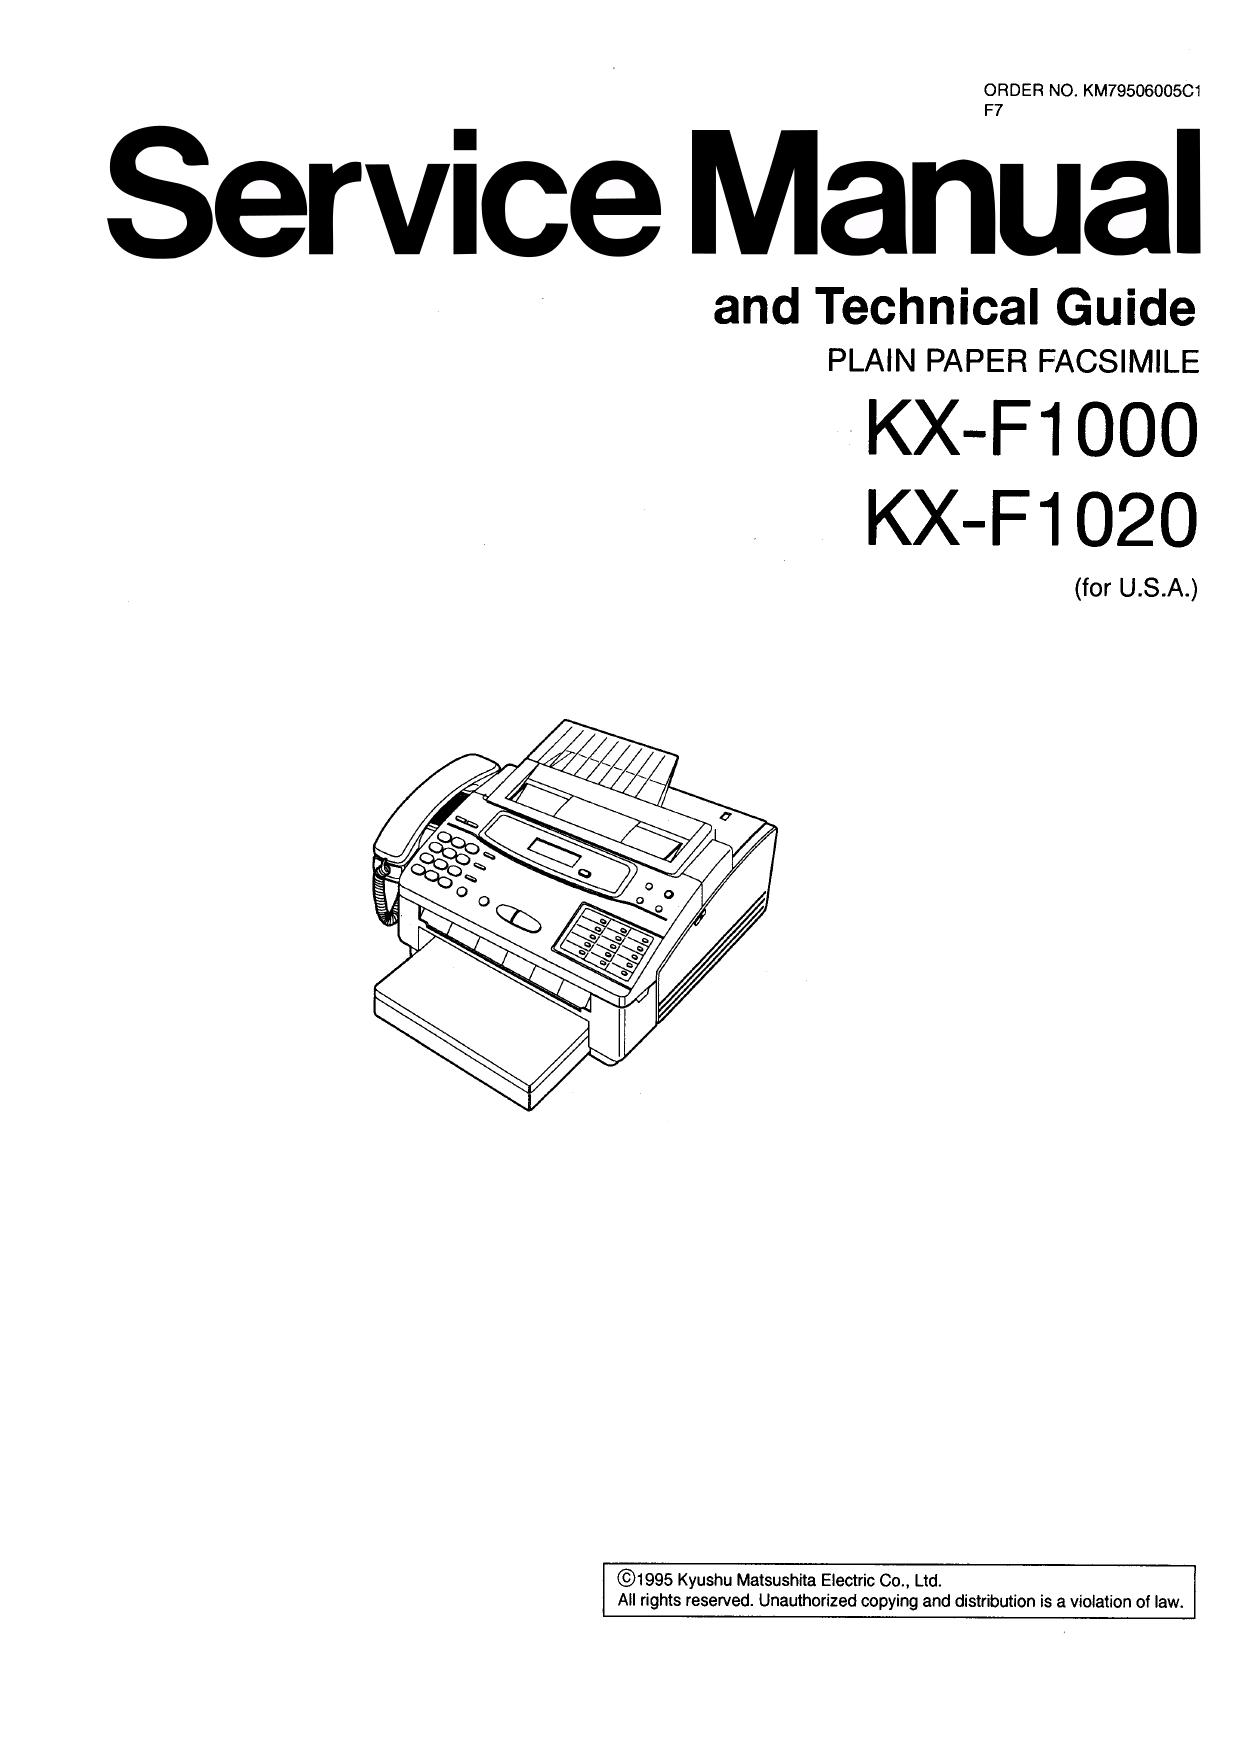 Download free pdf for Panasonic KX-F1000 Fax Machine manual